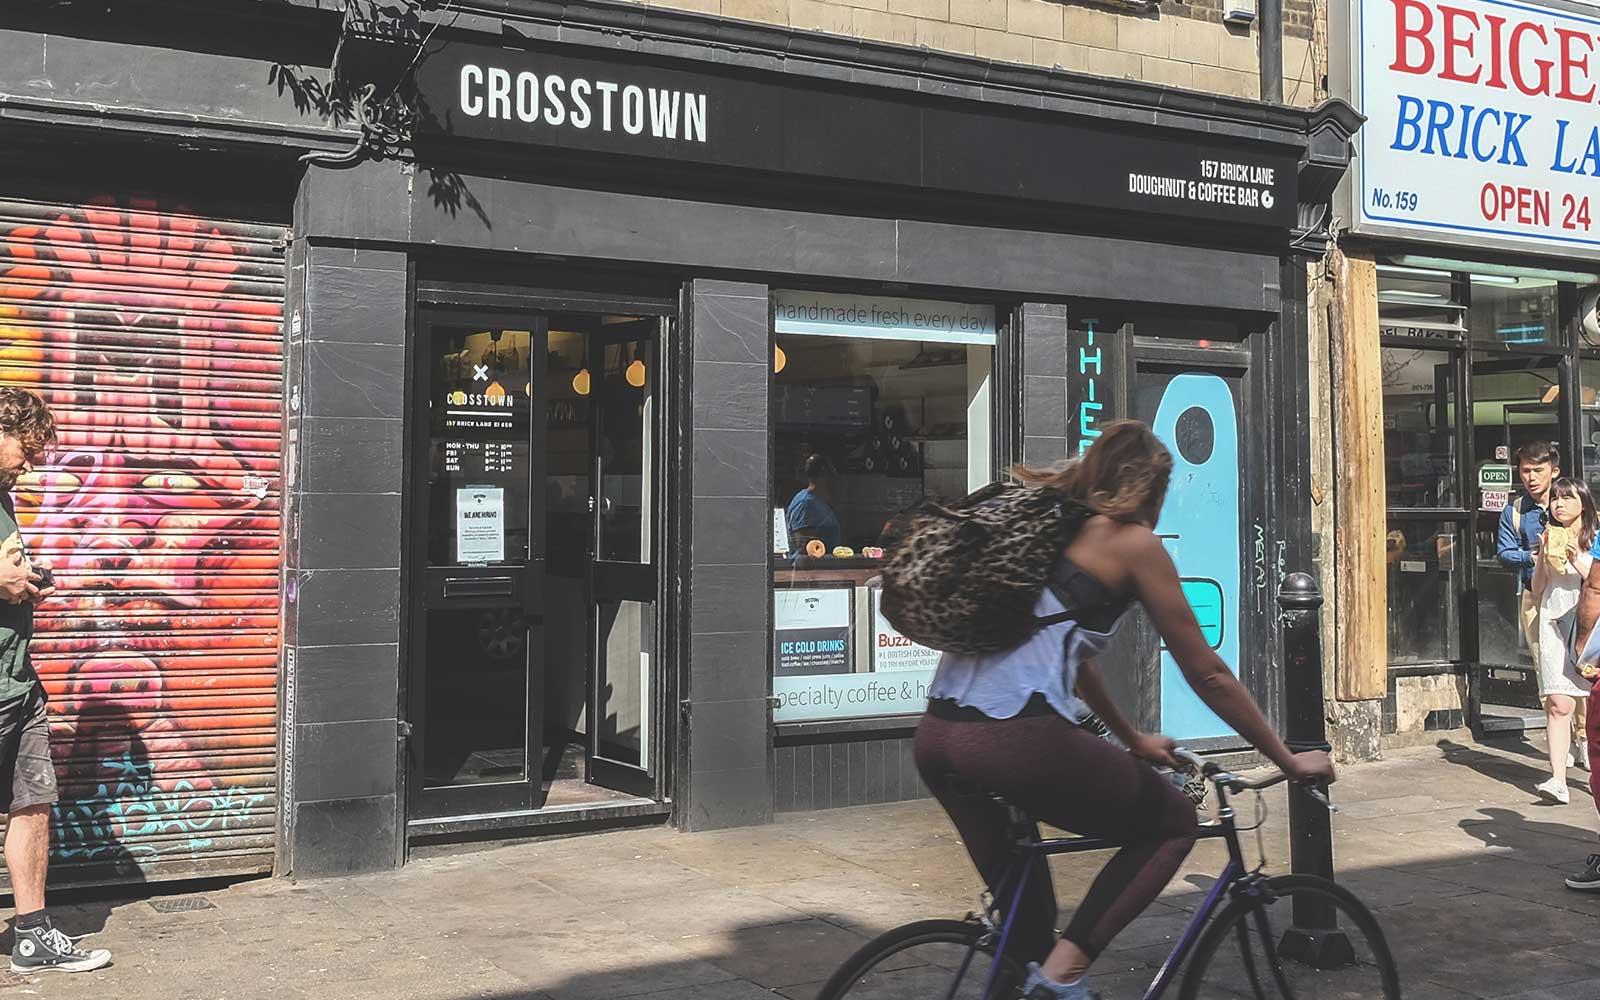 crosstown brick lane